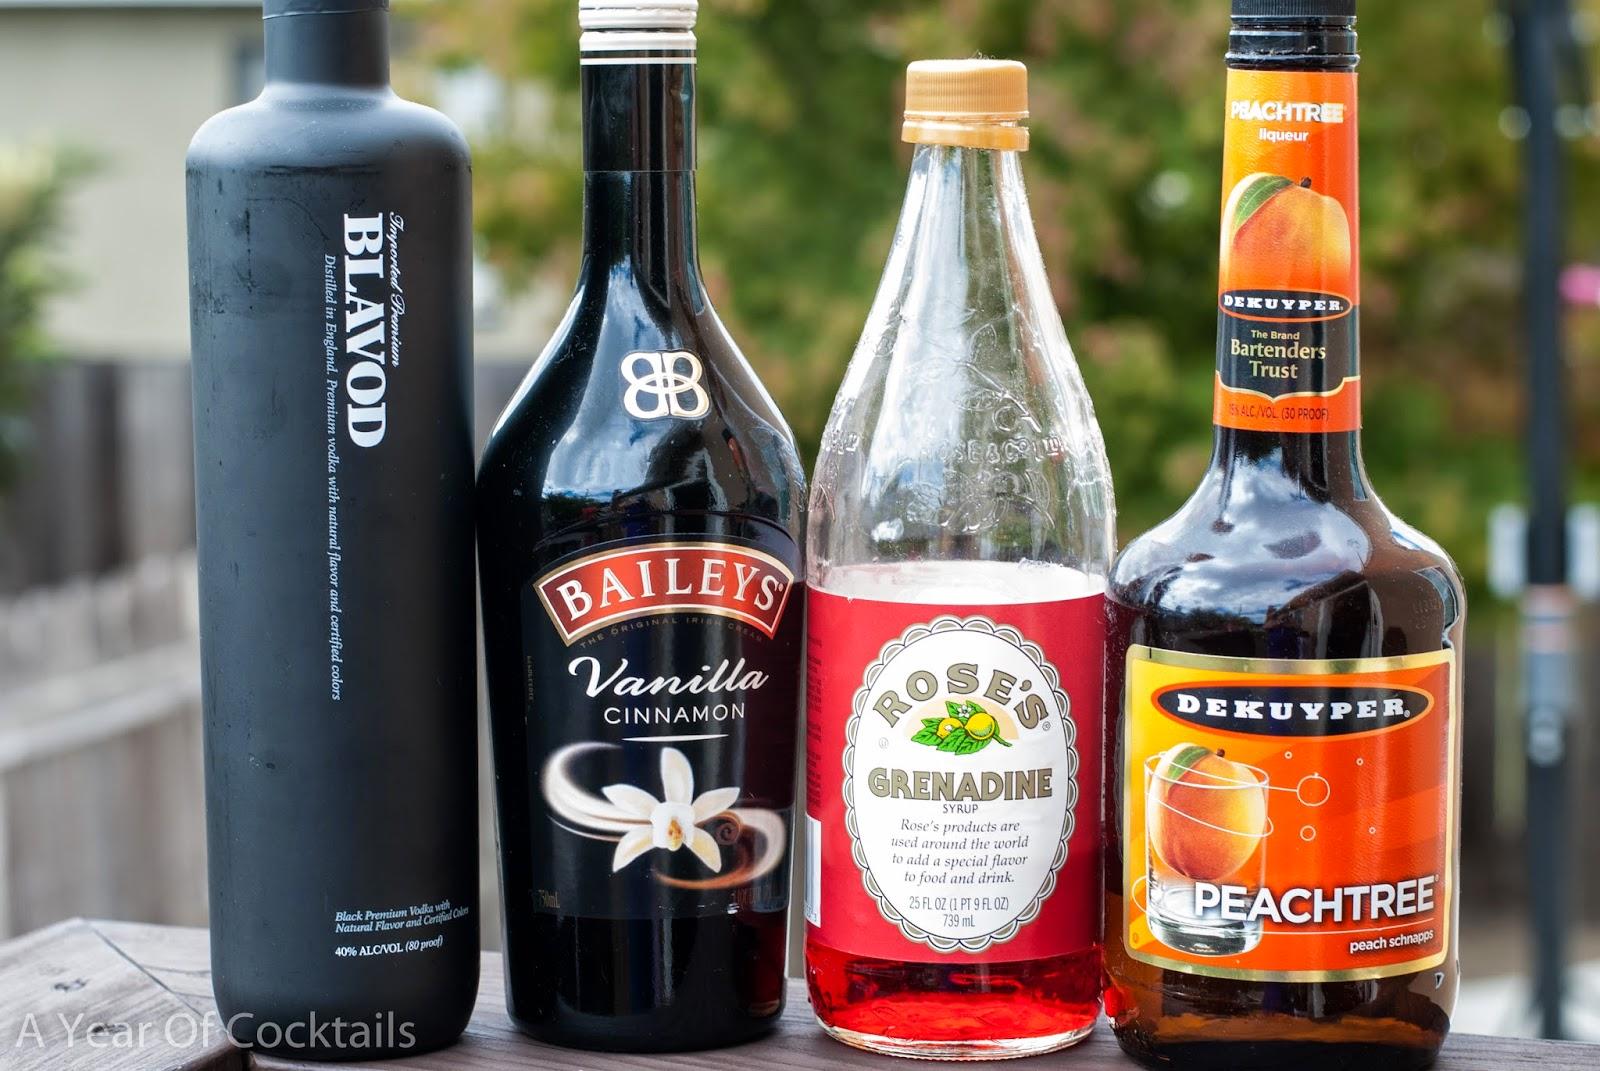 Halloween cocktail, peach schnapps, Baileys vanilla cinnamon, Irish Cream liqueur, black vodka